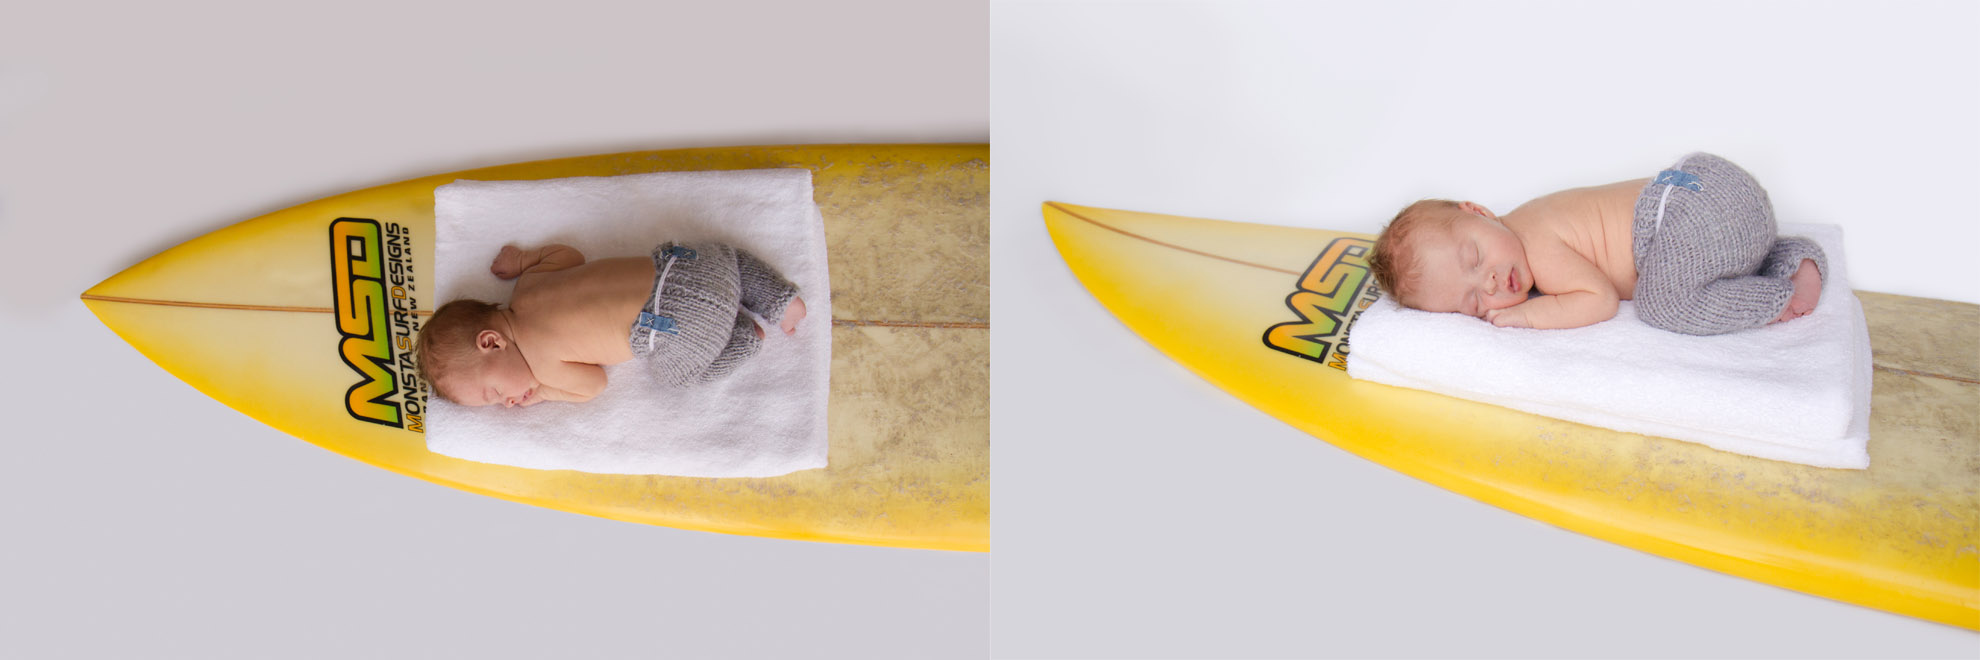 Hamilton-photographer-baby-on-surfboard.jpg